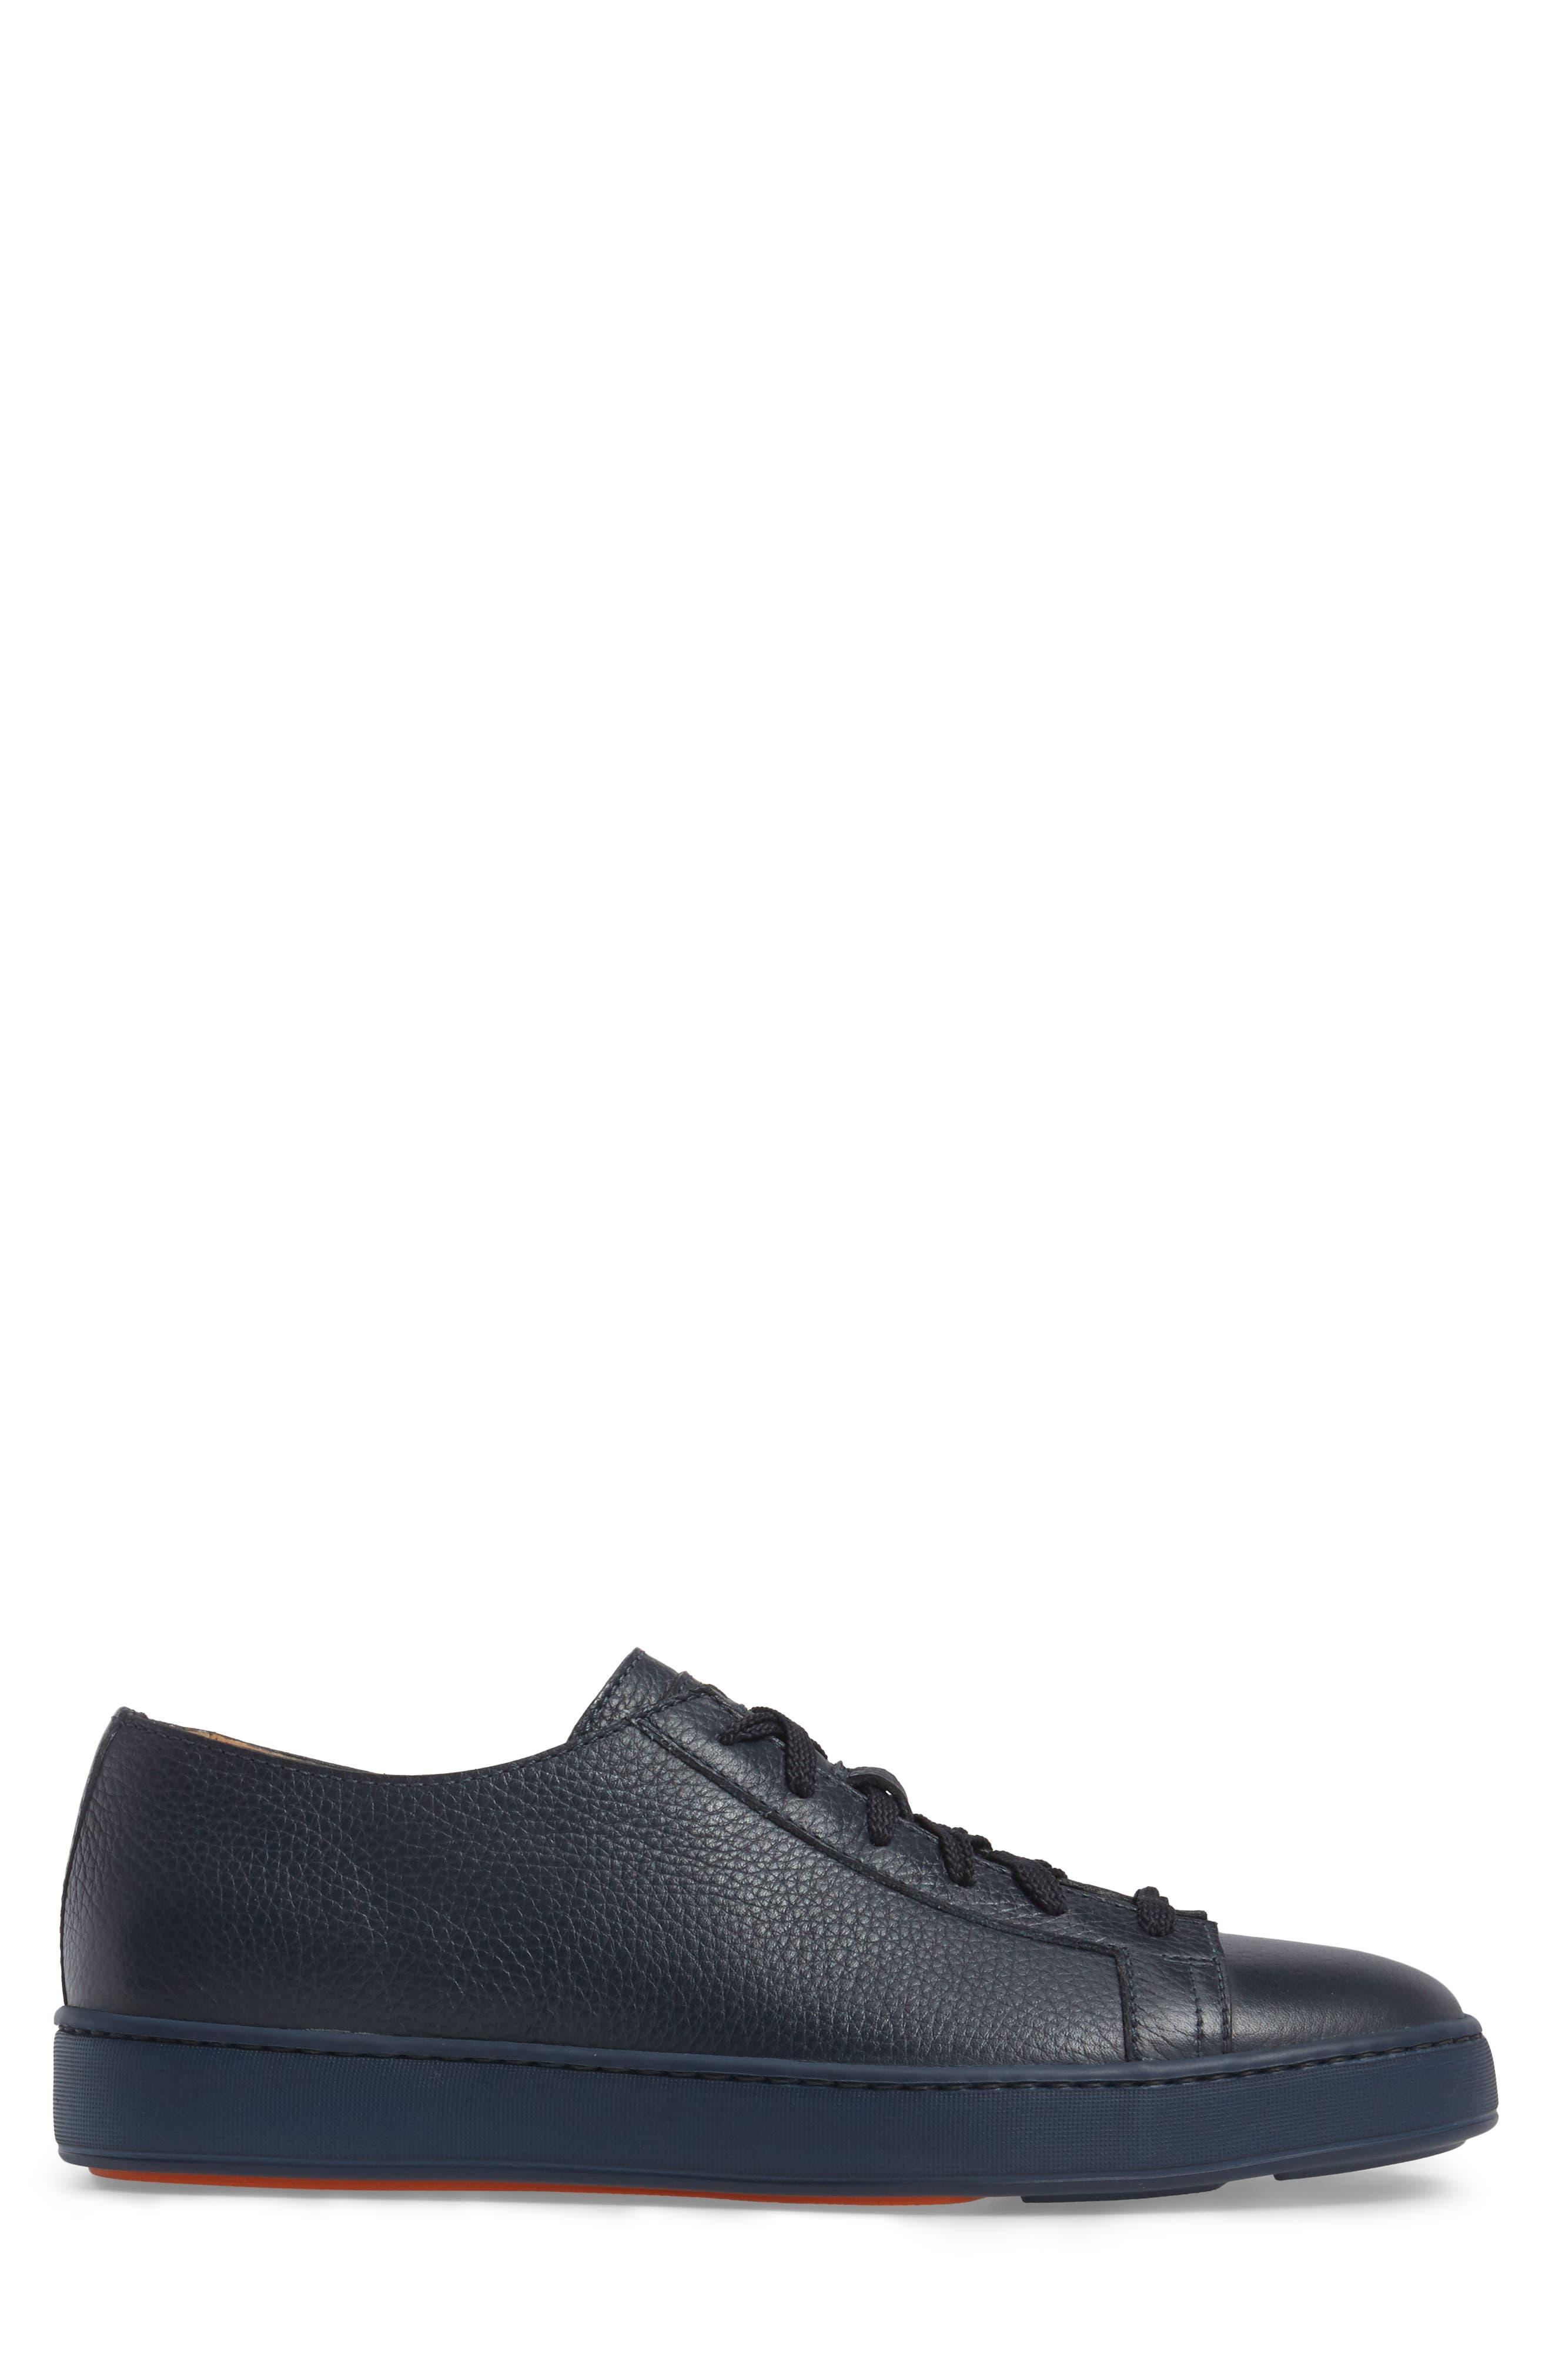 Cleanic Sneaker,                             Alternate thumbnail 13, color,